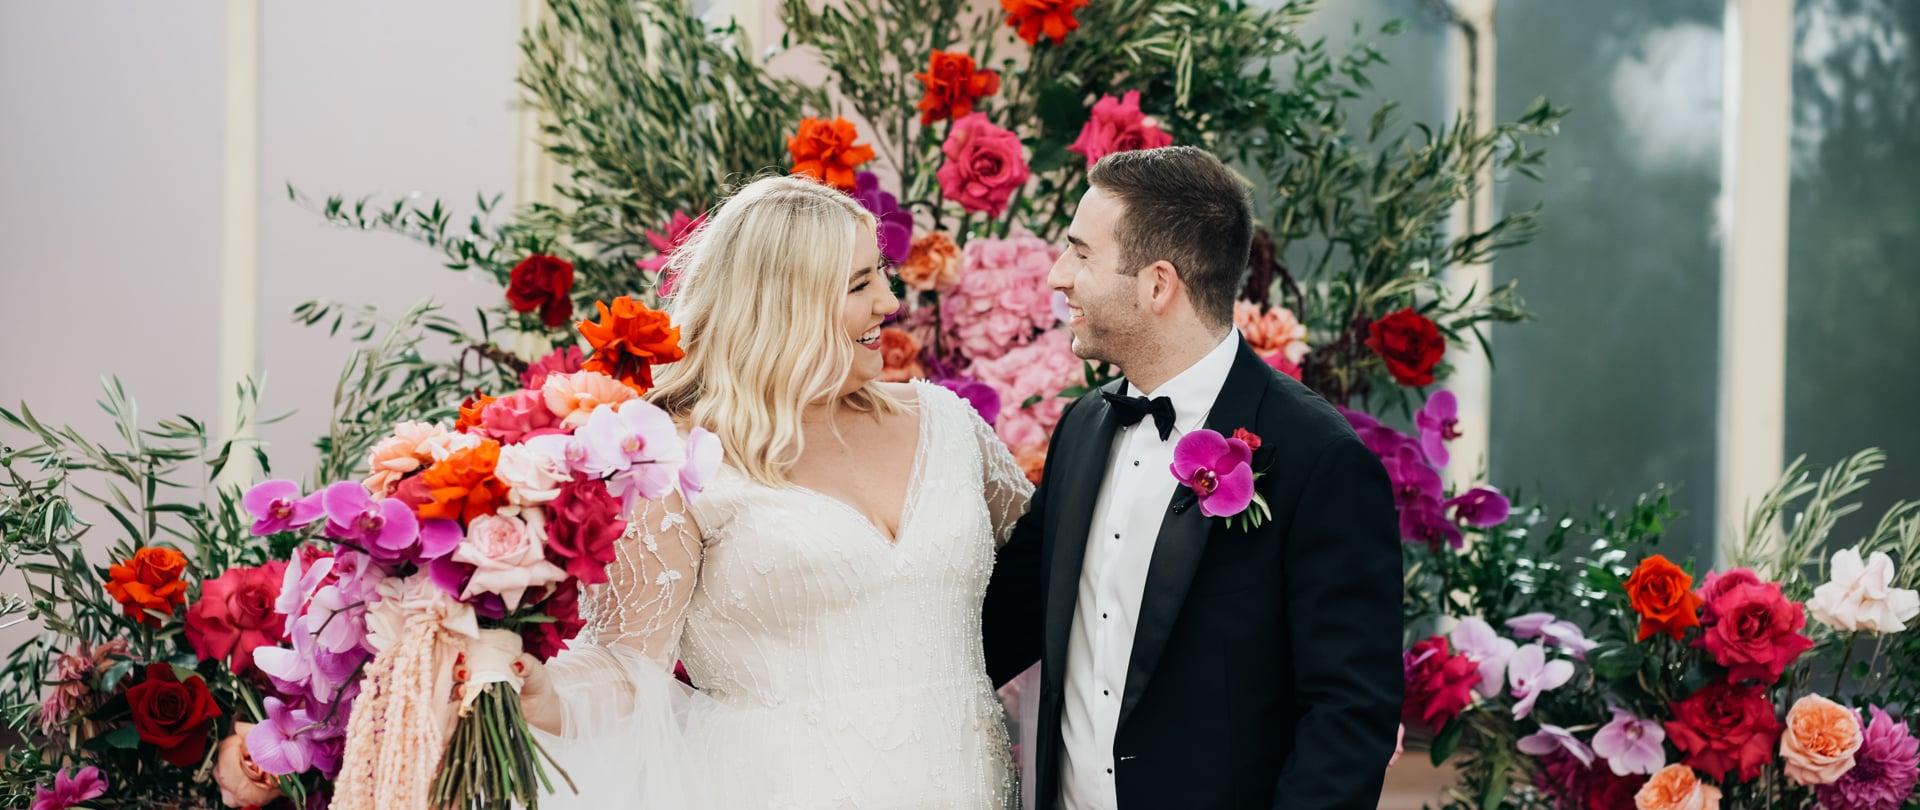 Jordan & Peter Wedding Video Filmed at Sydney, New South Wales